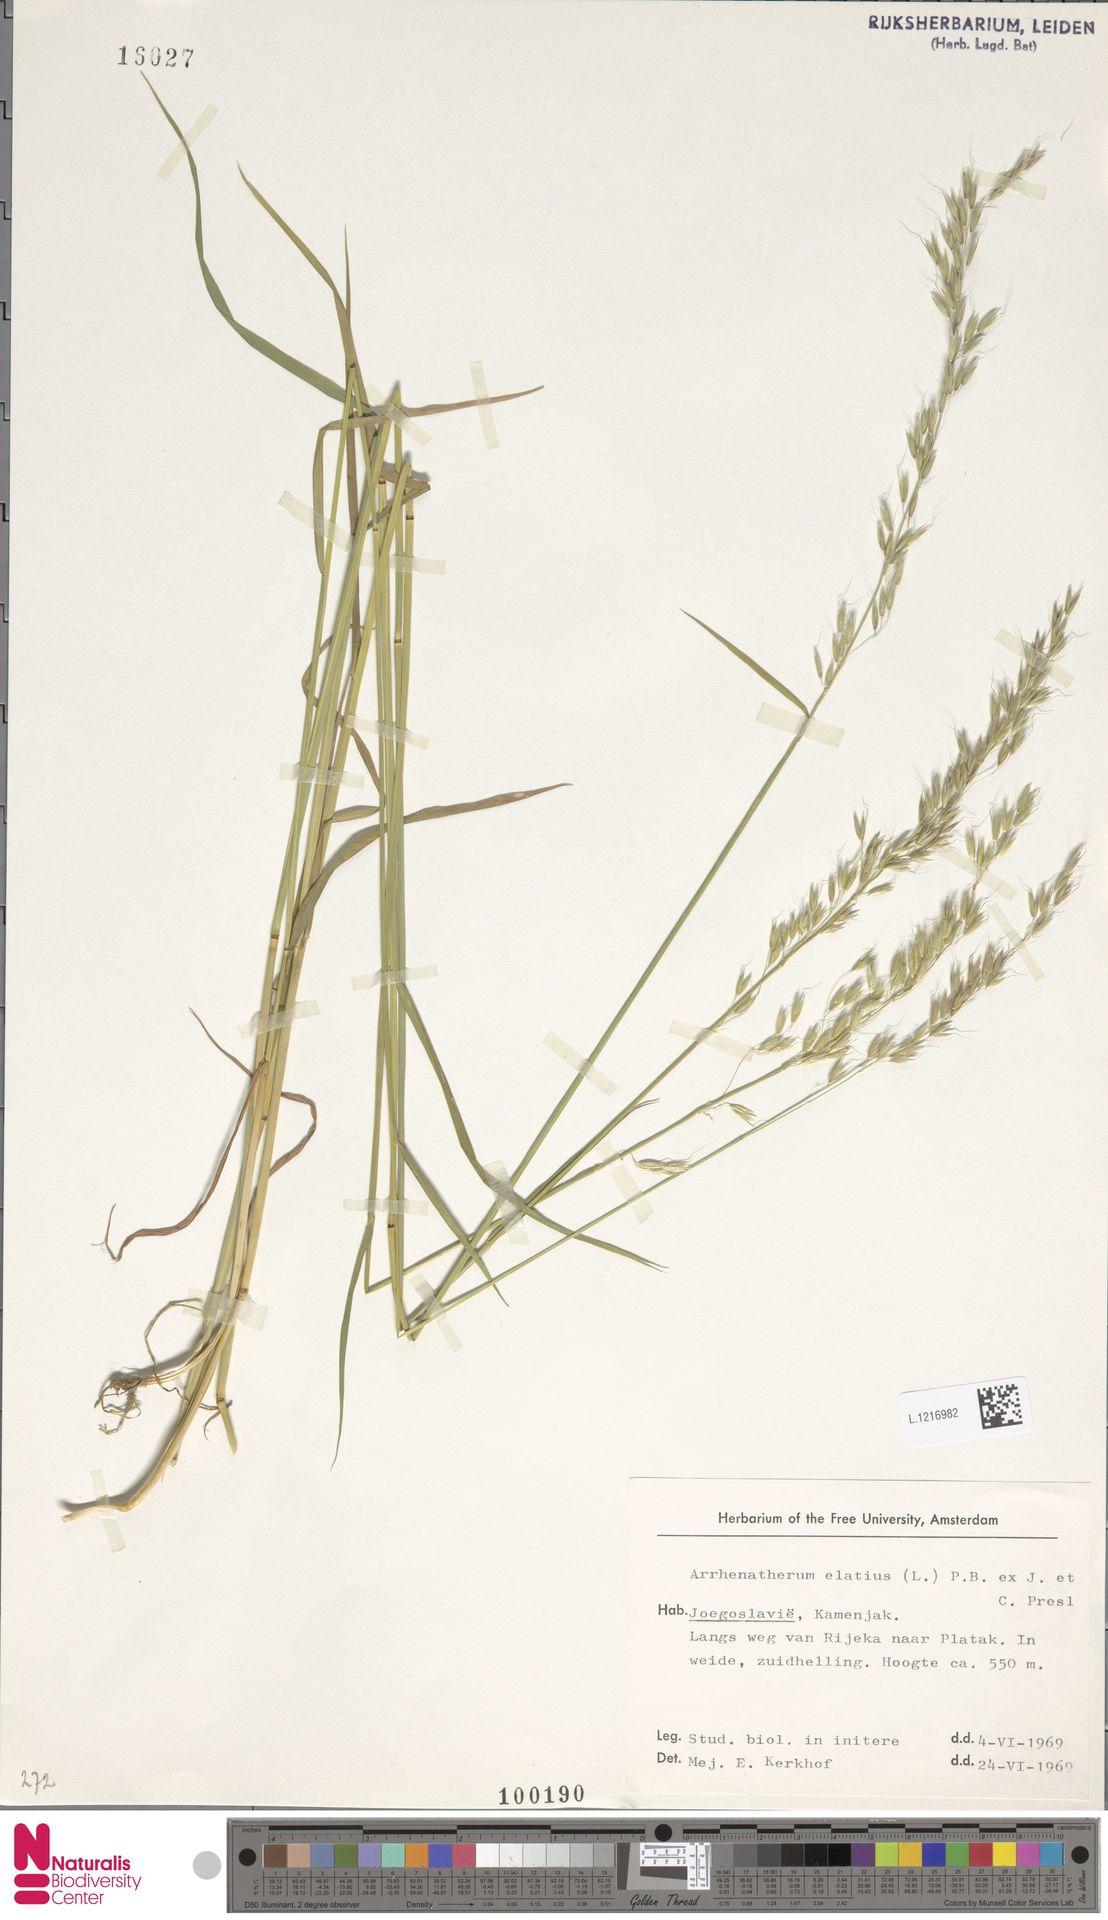 L.1216982 | Arrhenatherum elatius (L.) P.Beauv. ex J.Presl & C.Presl